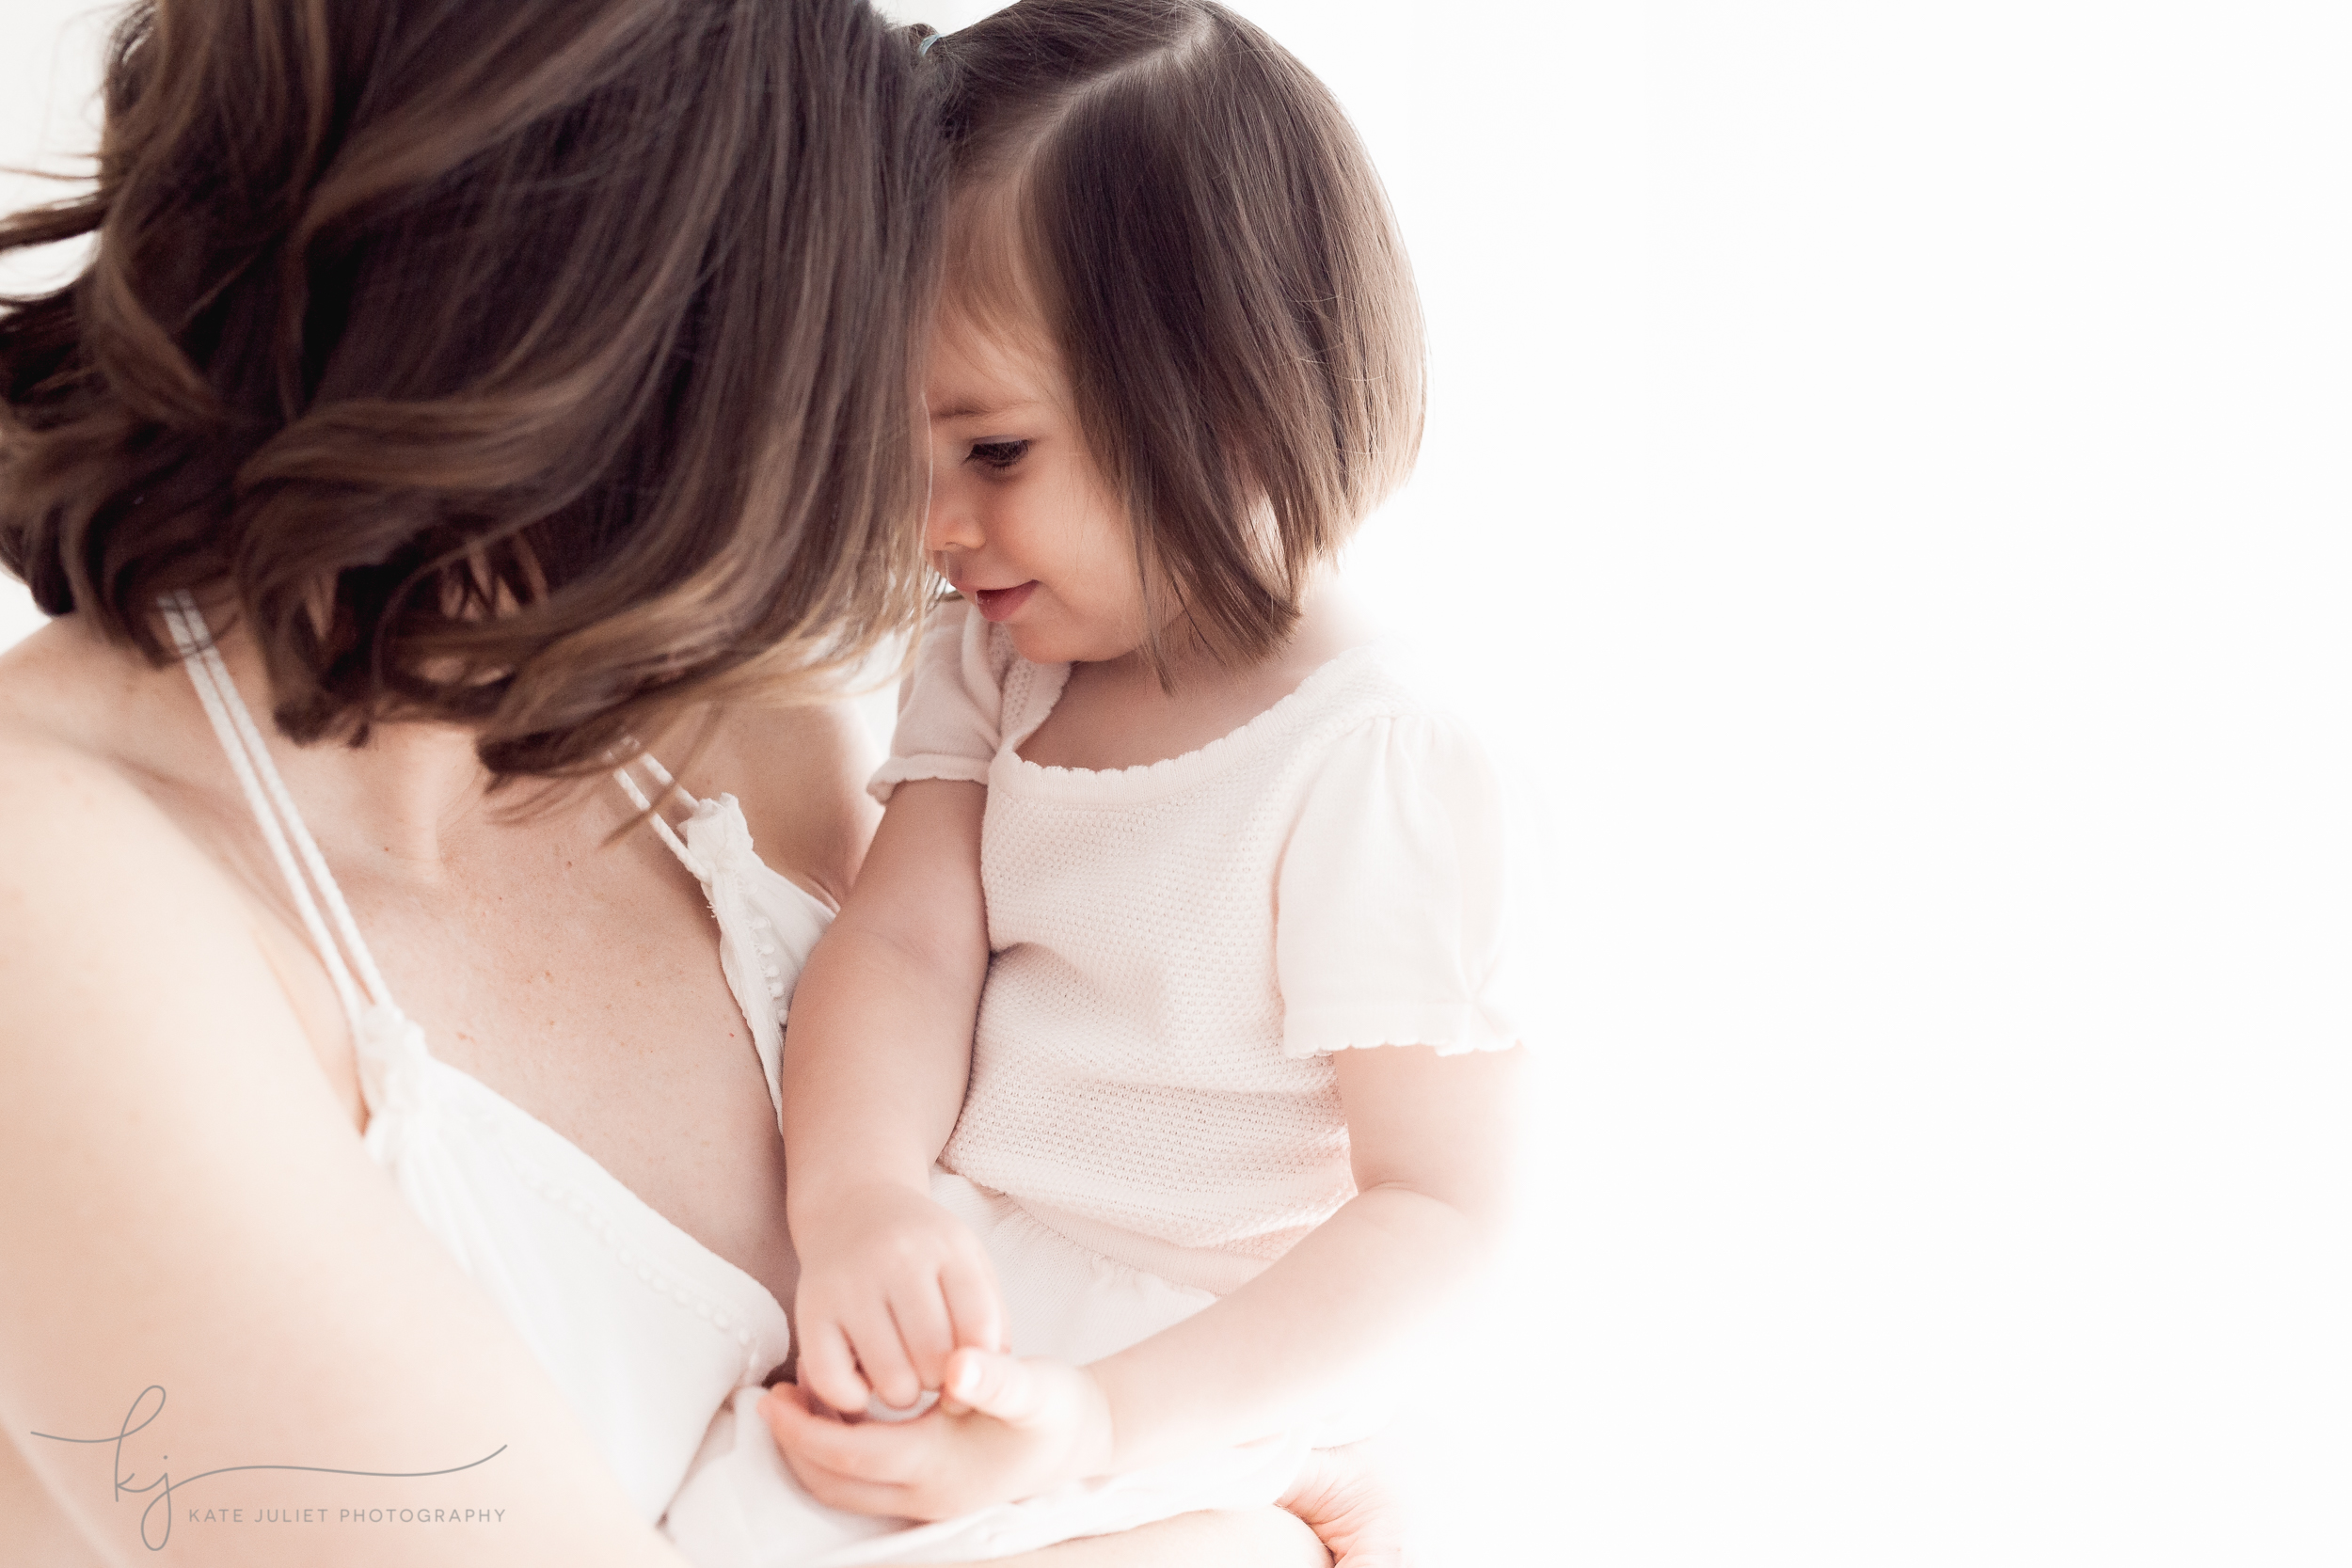 kate_juliet_photography_maternity_arlington_wm-053048 (1).jpg